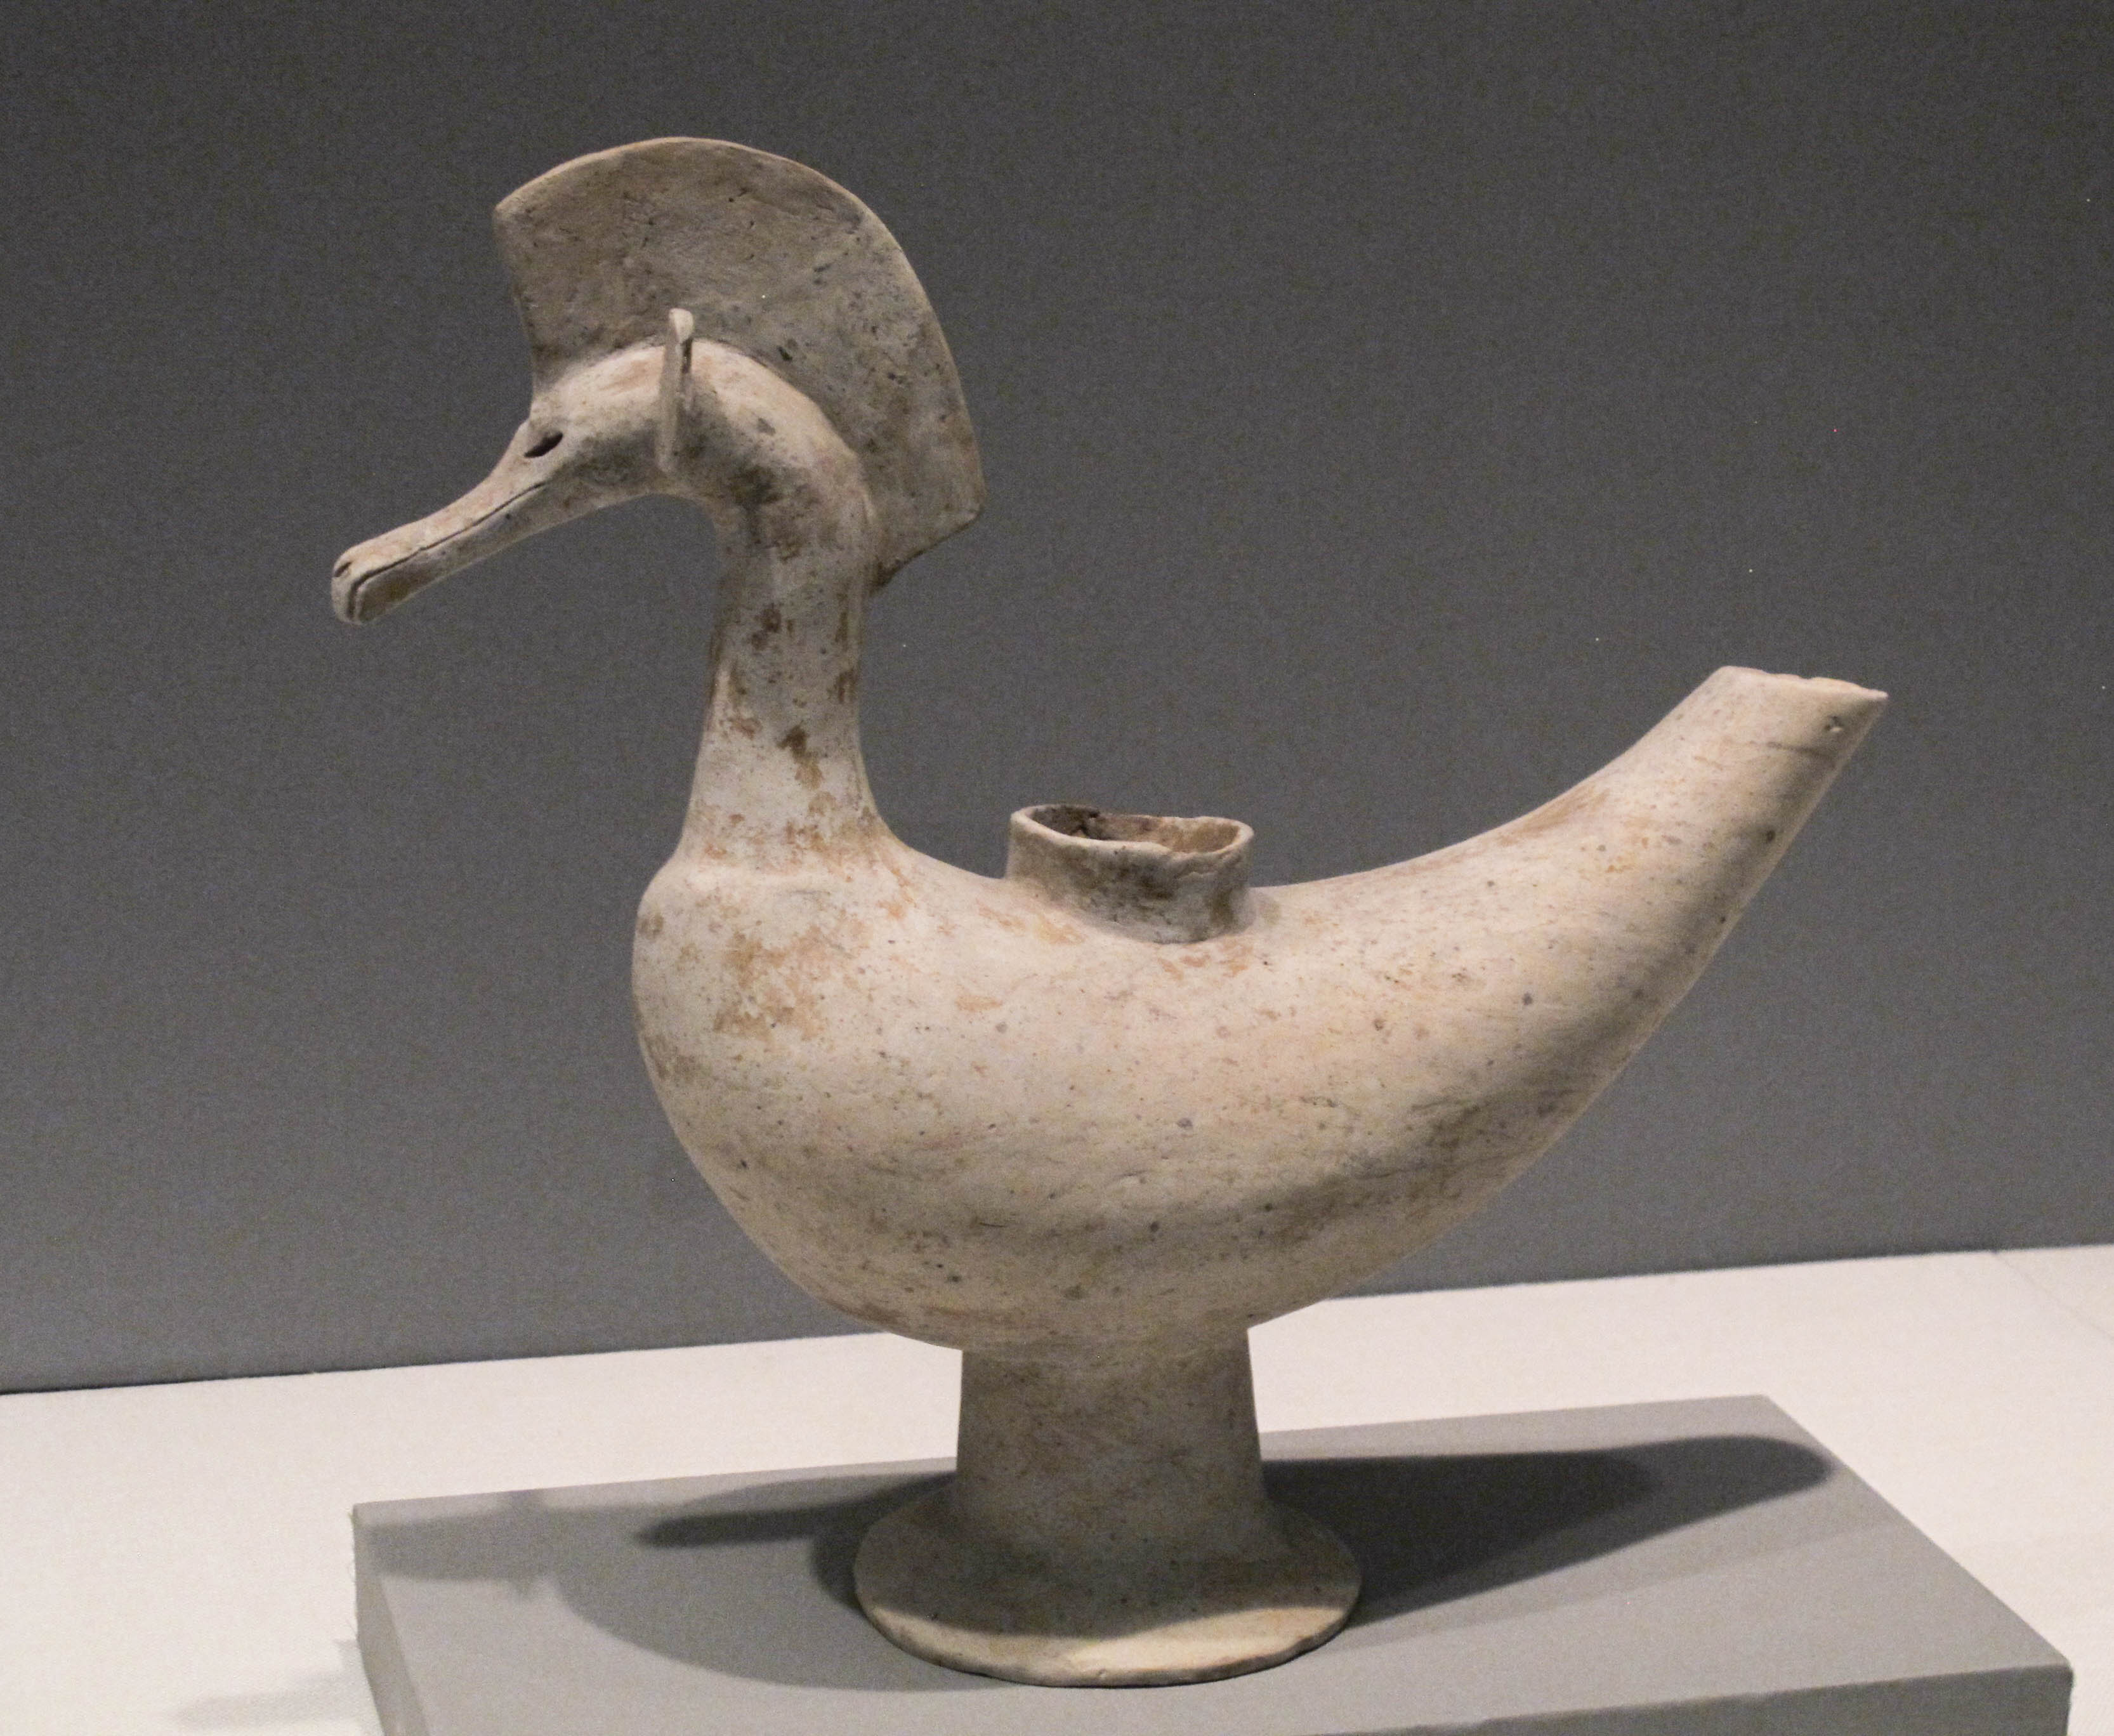 File:Korea-Proto 3 Kingdoms Bird-shaped pottery jpg